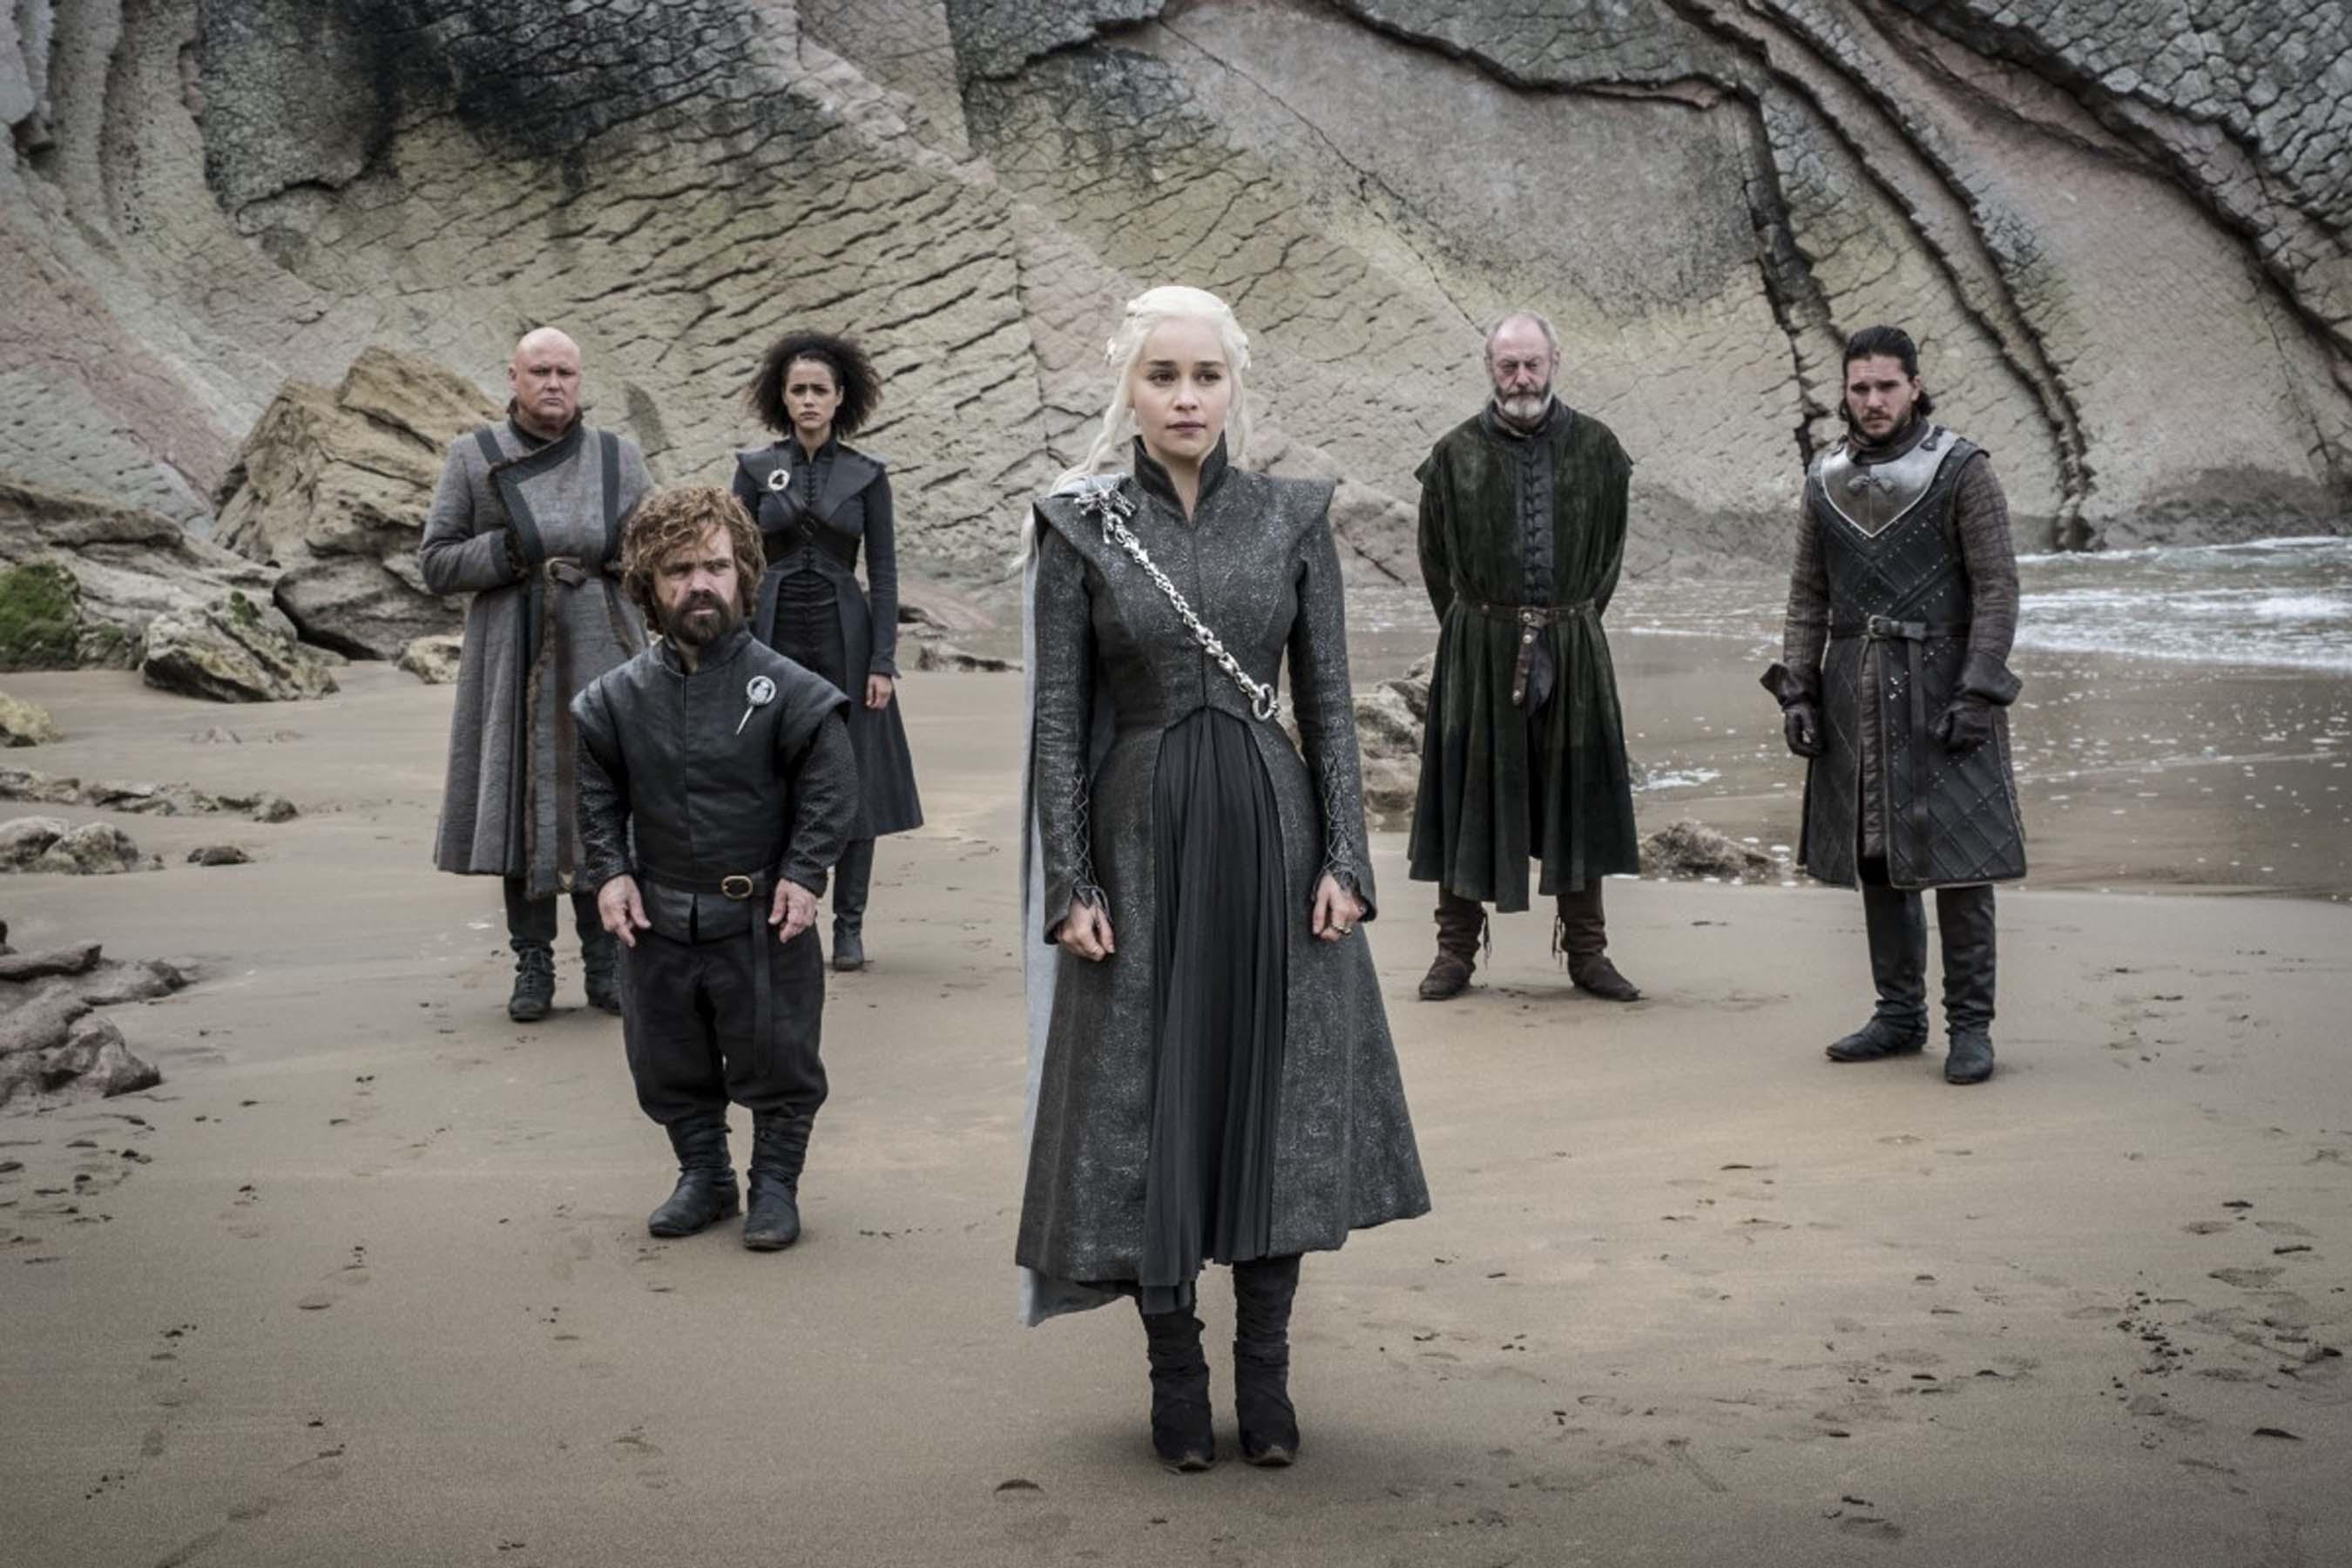 watch free online game of thrones season 7